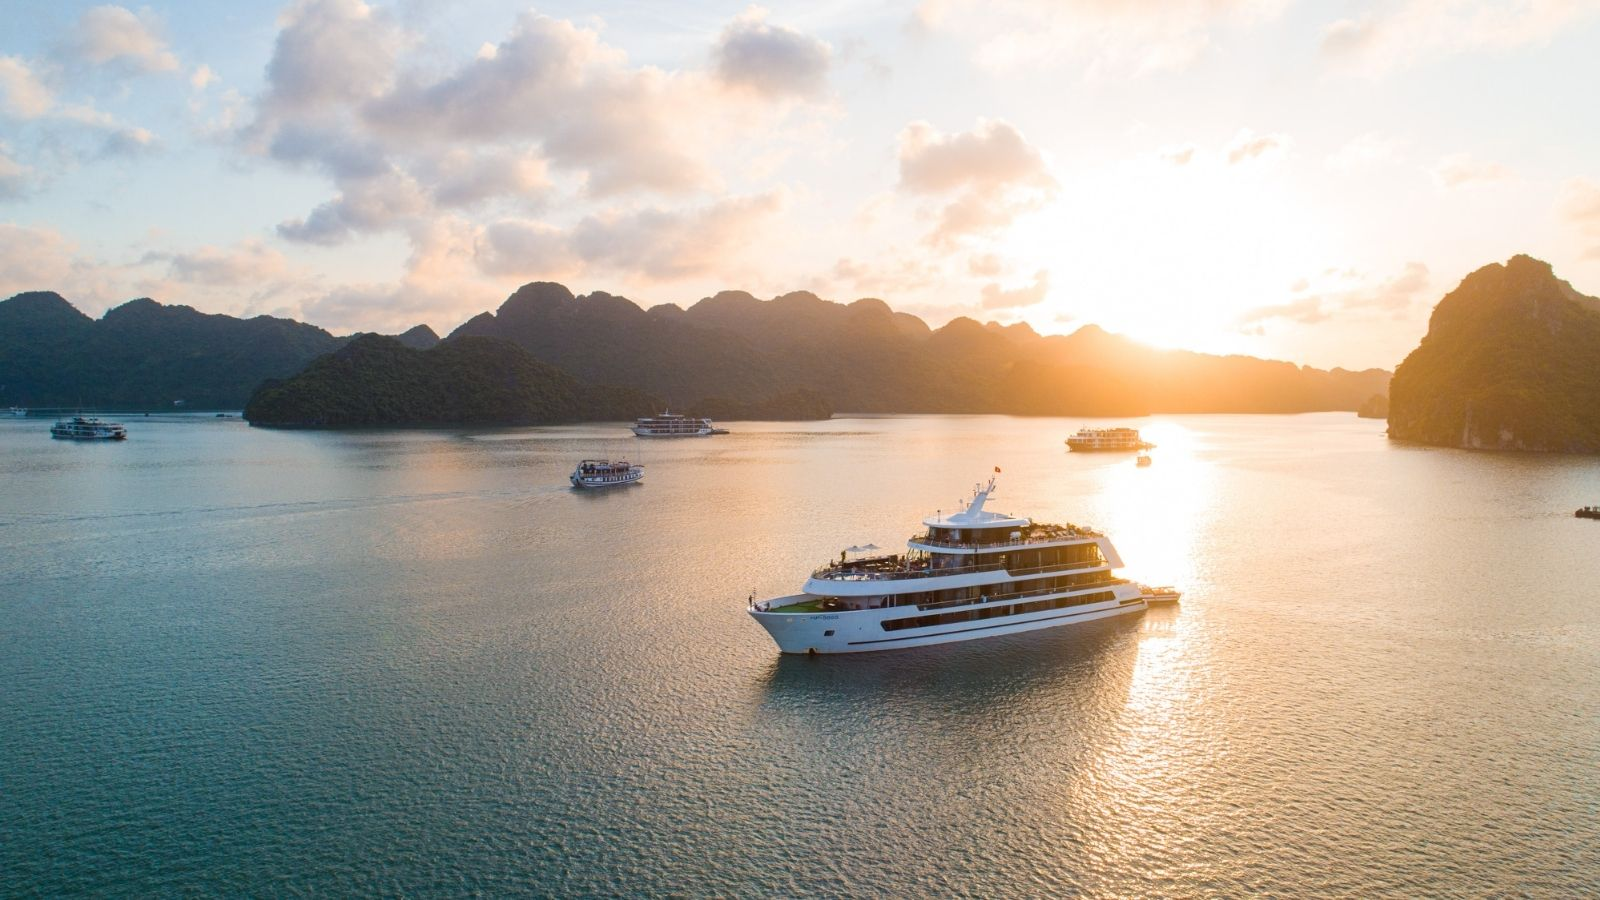 Halong Bay Cruise - Vietnam and Thailand itinerary